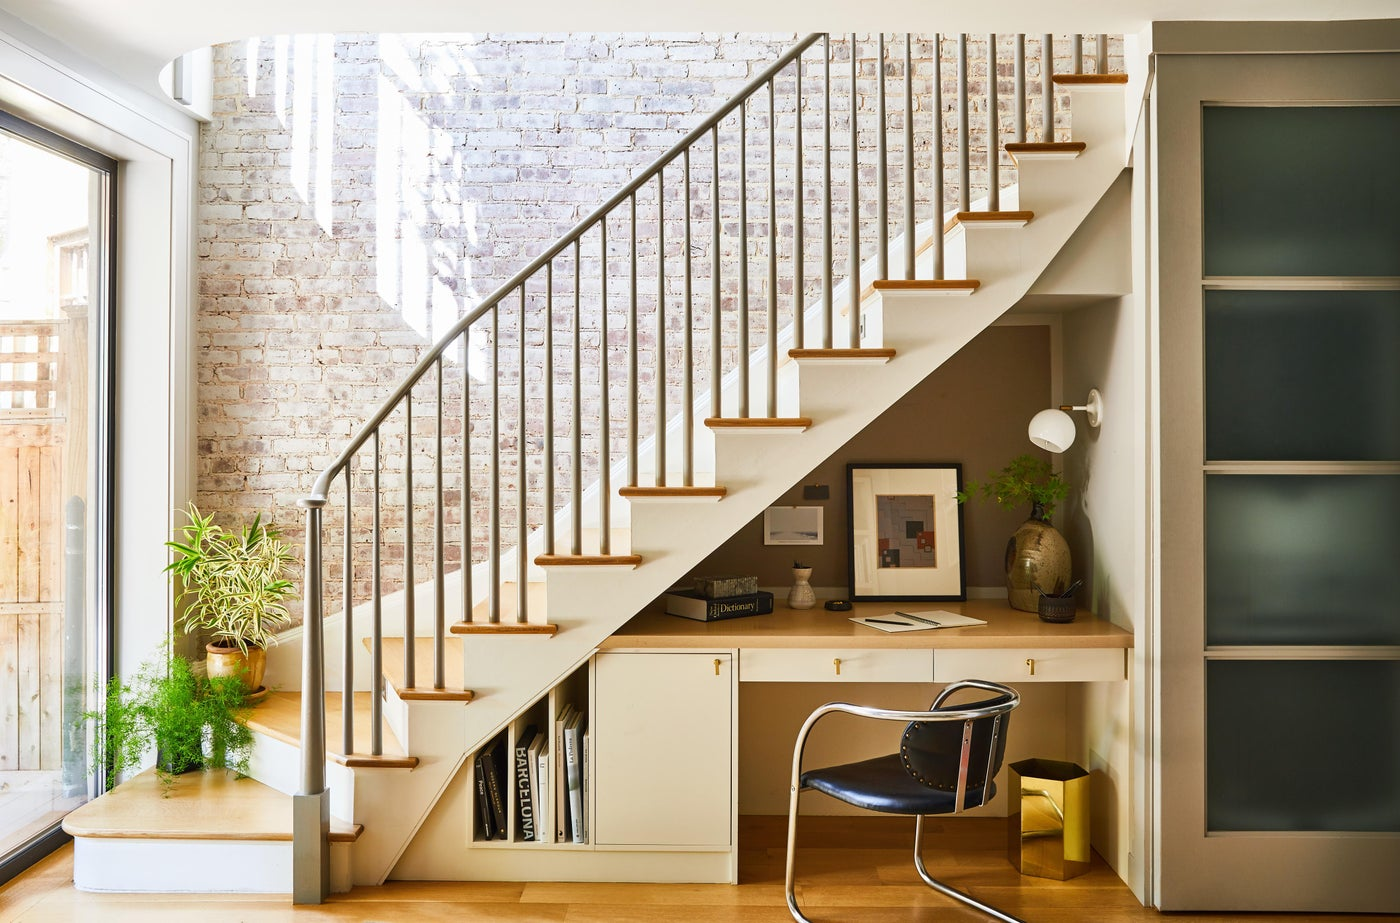 Hudson Street Brownstone I Staircase Nook | Exposed Brick | Office | Desk Nook